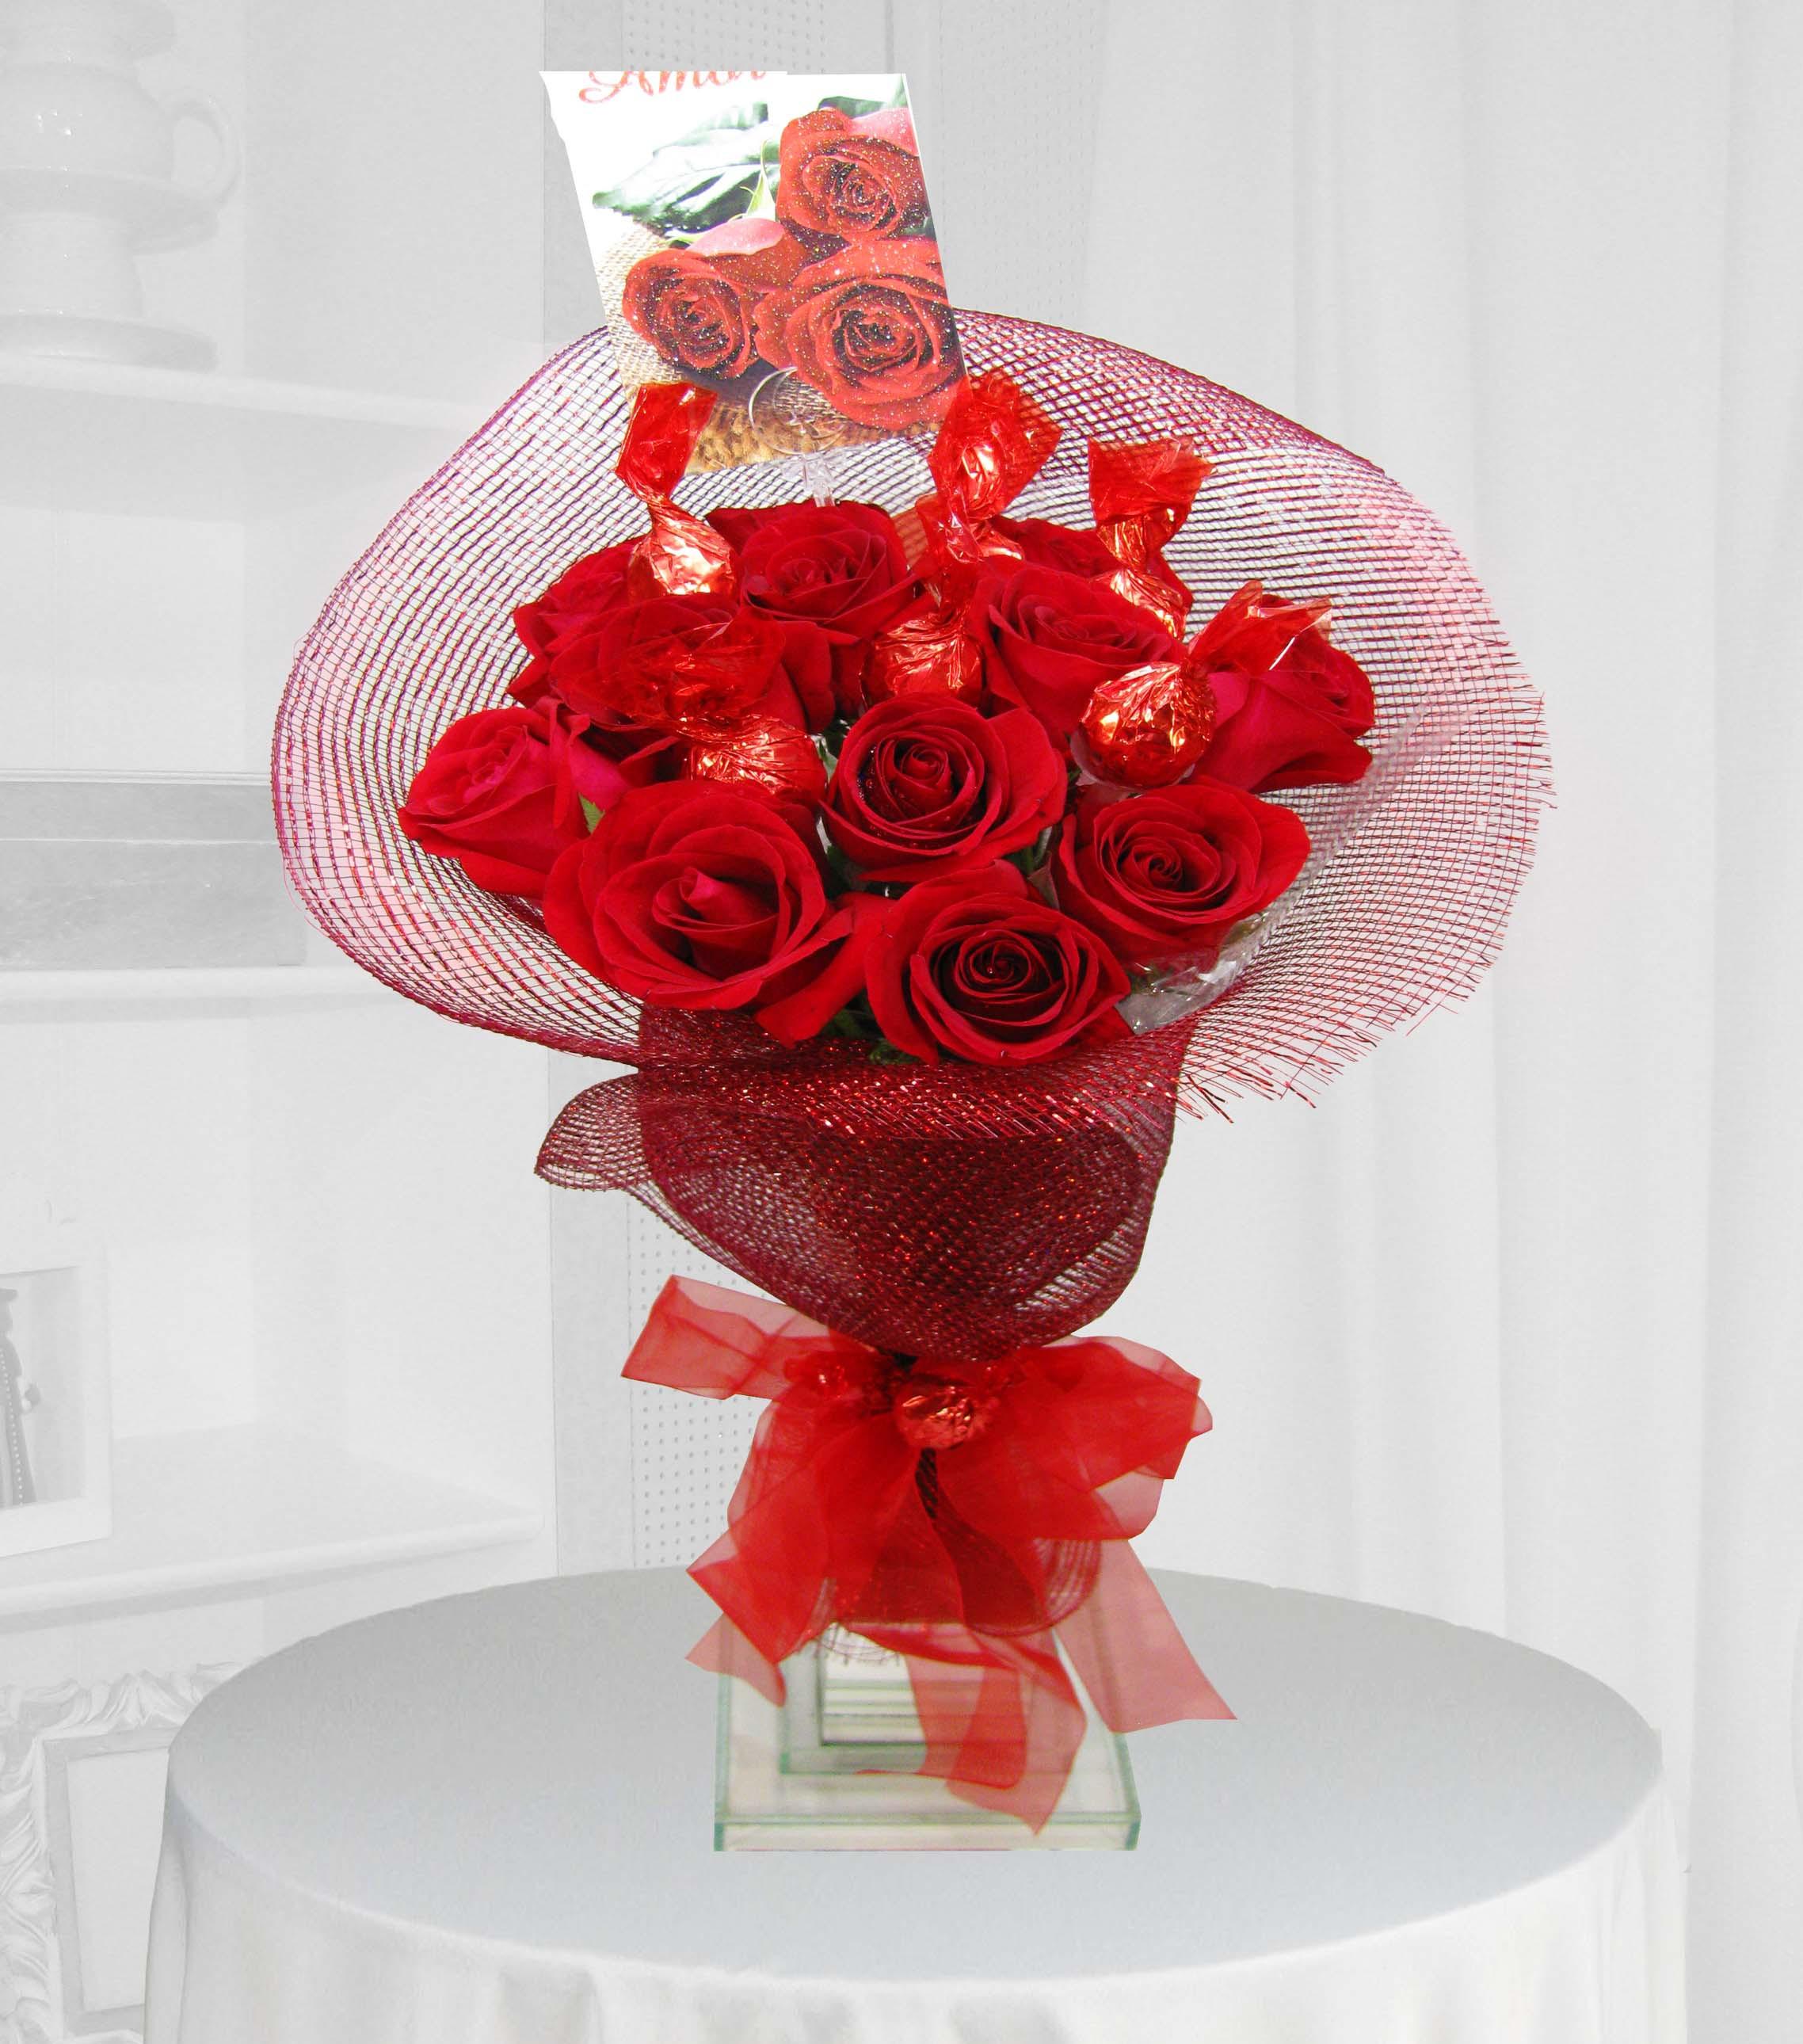 ramalhete de rosas com bombons